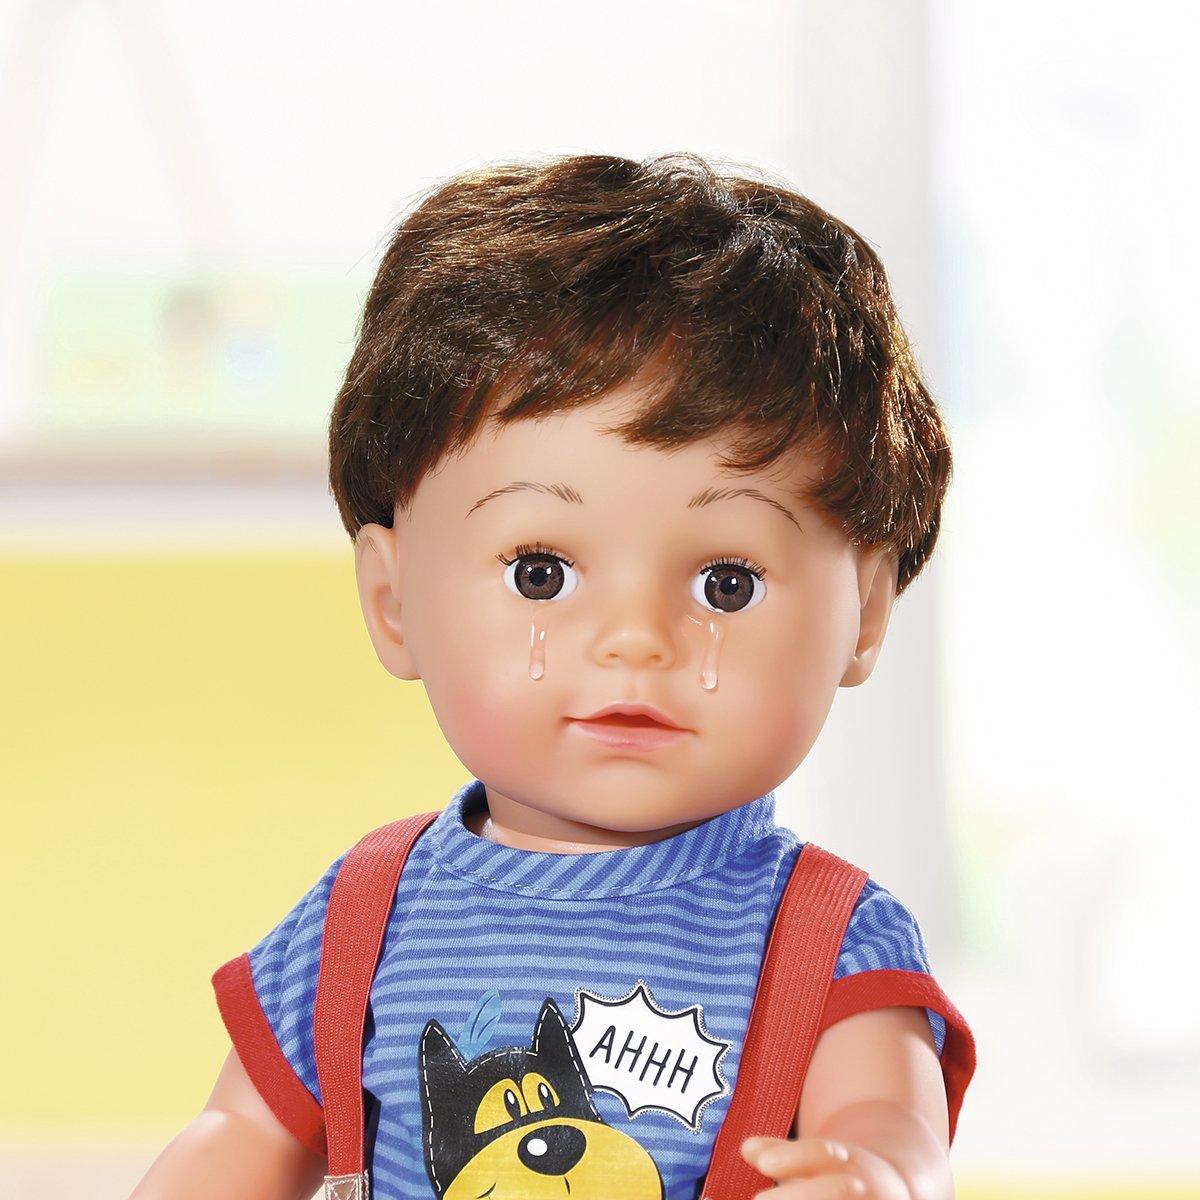 Купить Куклы и наборы, Интерактивная кукла Baby Born Старший братик 825365 ТМ: BABY born